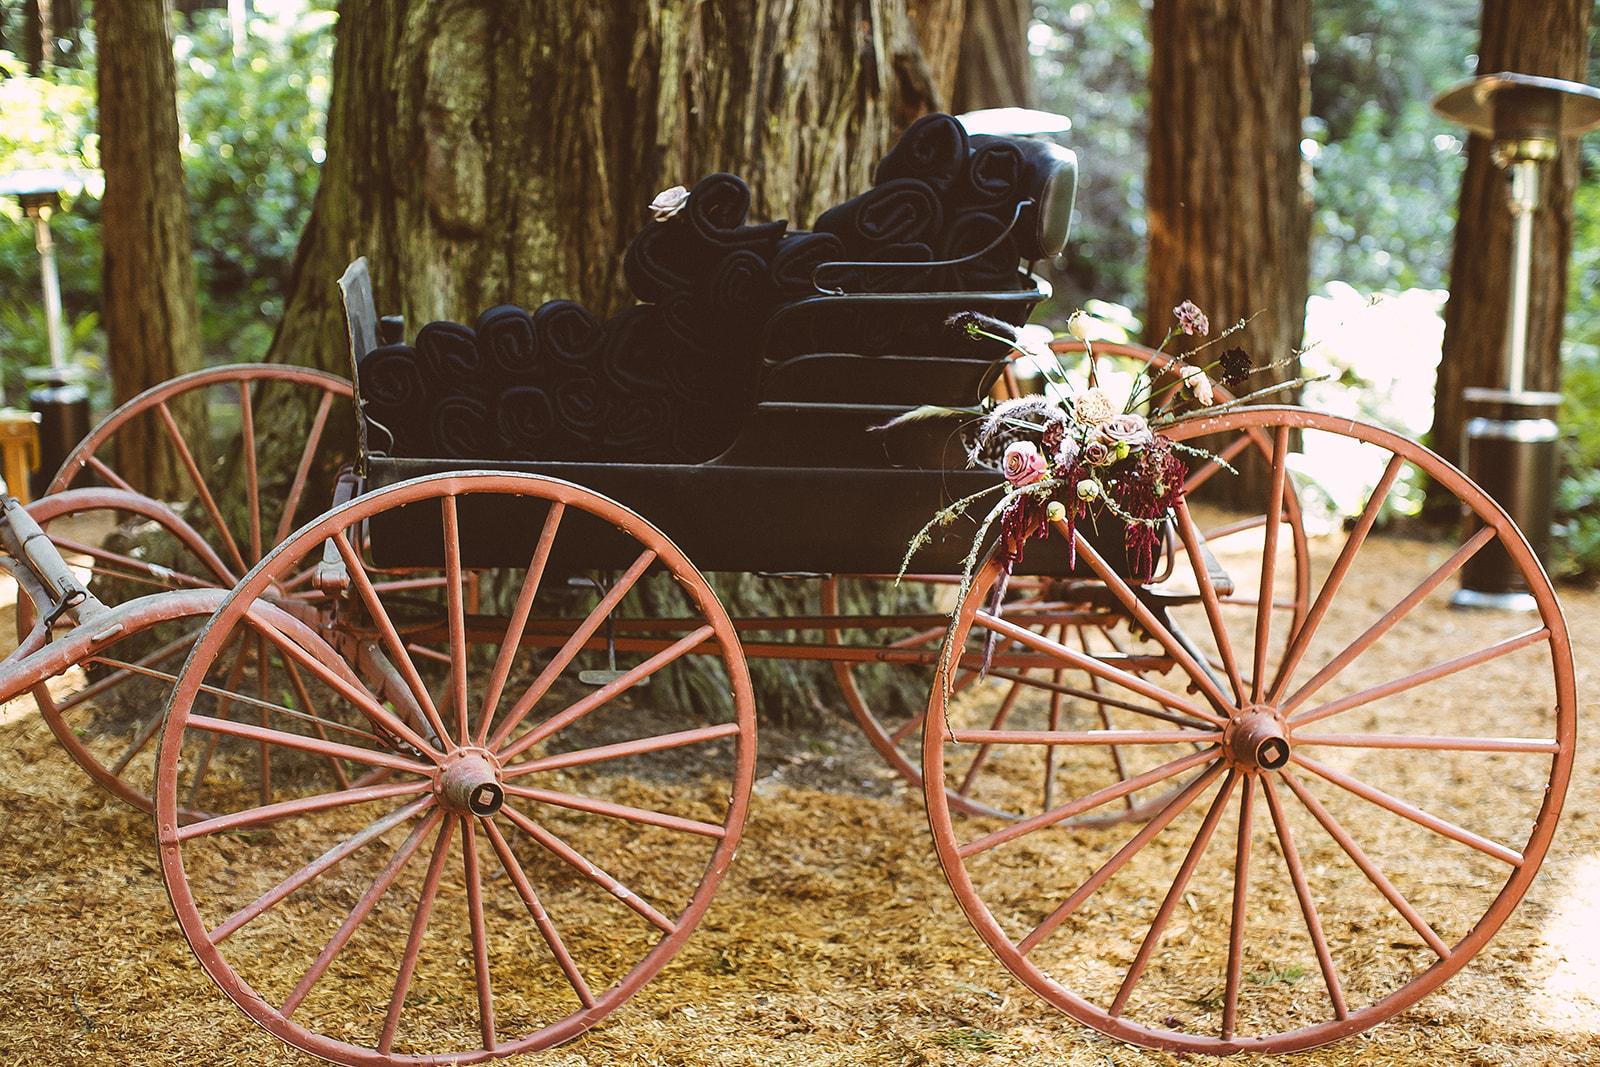 Truckee Top wedding and event florist Ash + oak